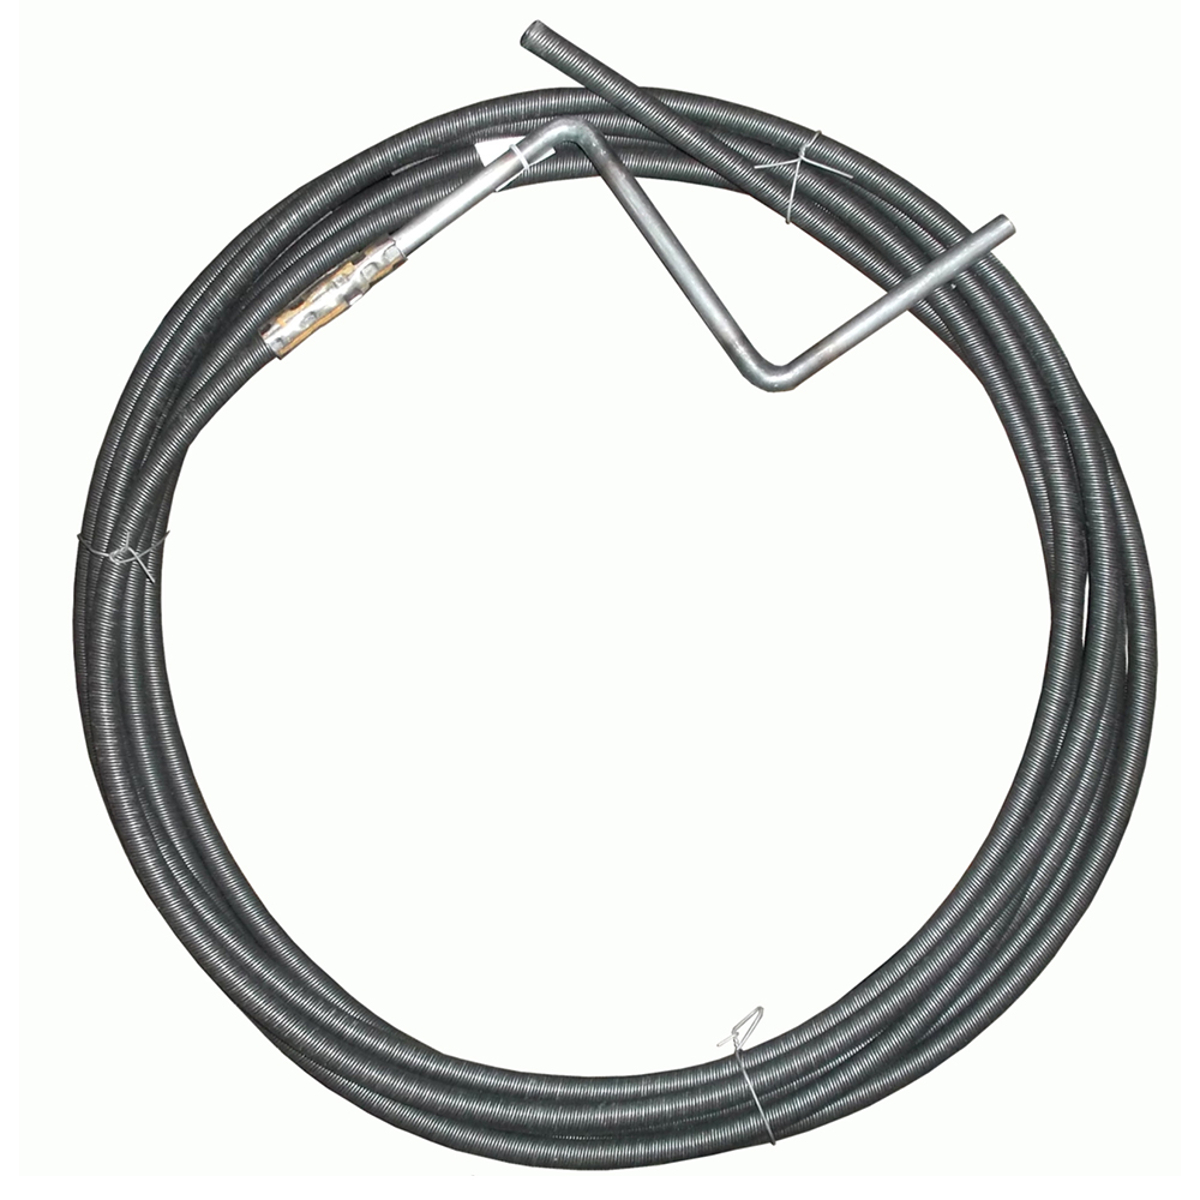 Трос пружинный для прочистки канализационных труб Masterprof, 6 мм х 5 м трос для прочистки канализационных труб 9 мм х 10 м